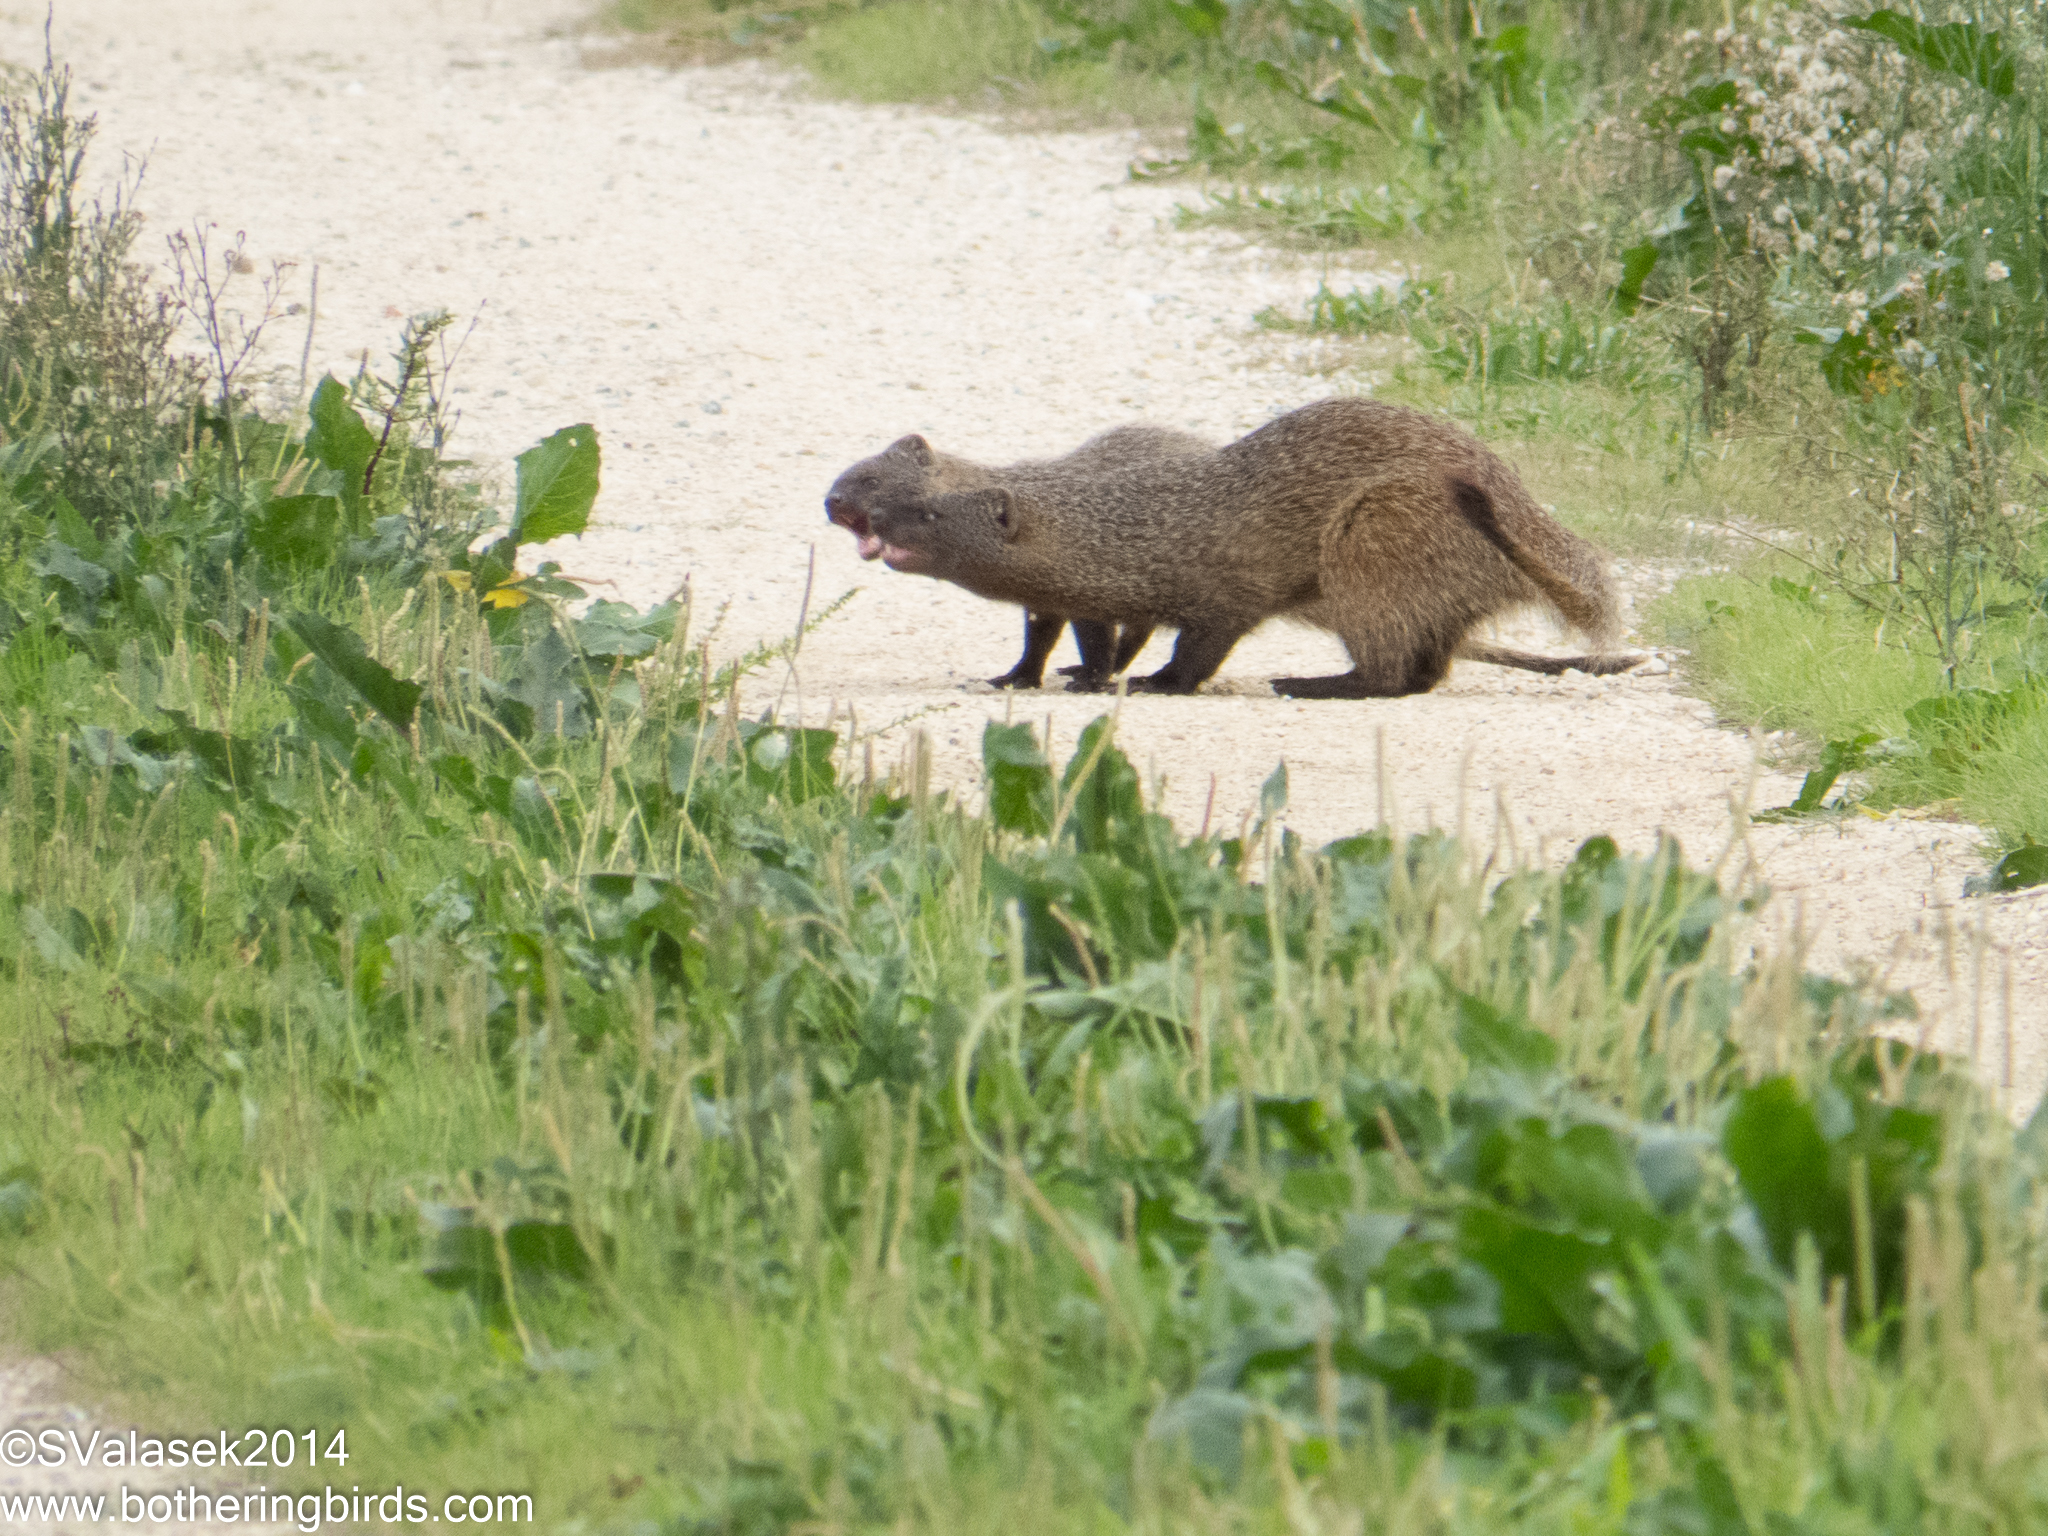 Egyptian Mongooses